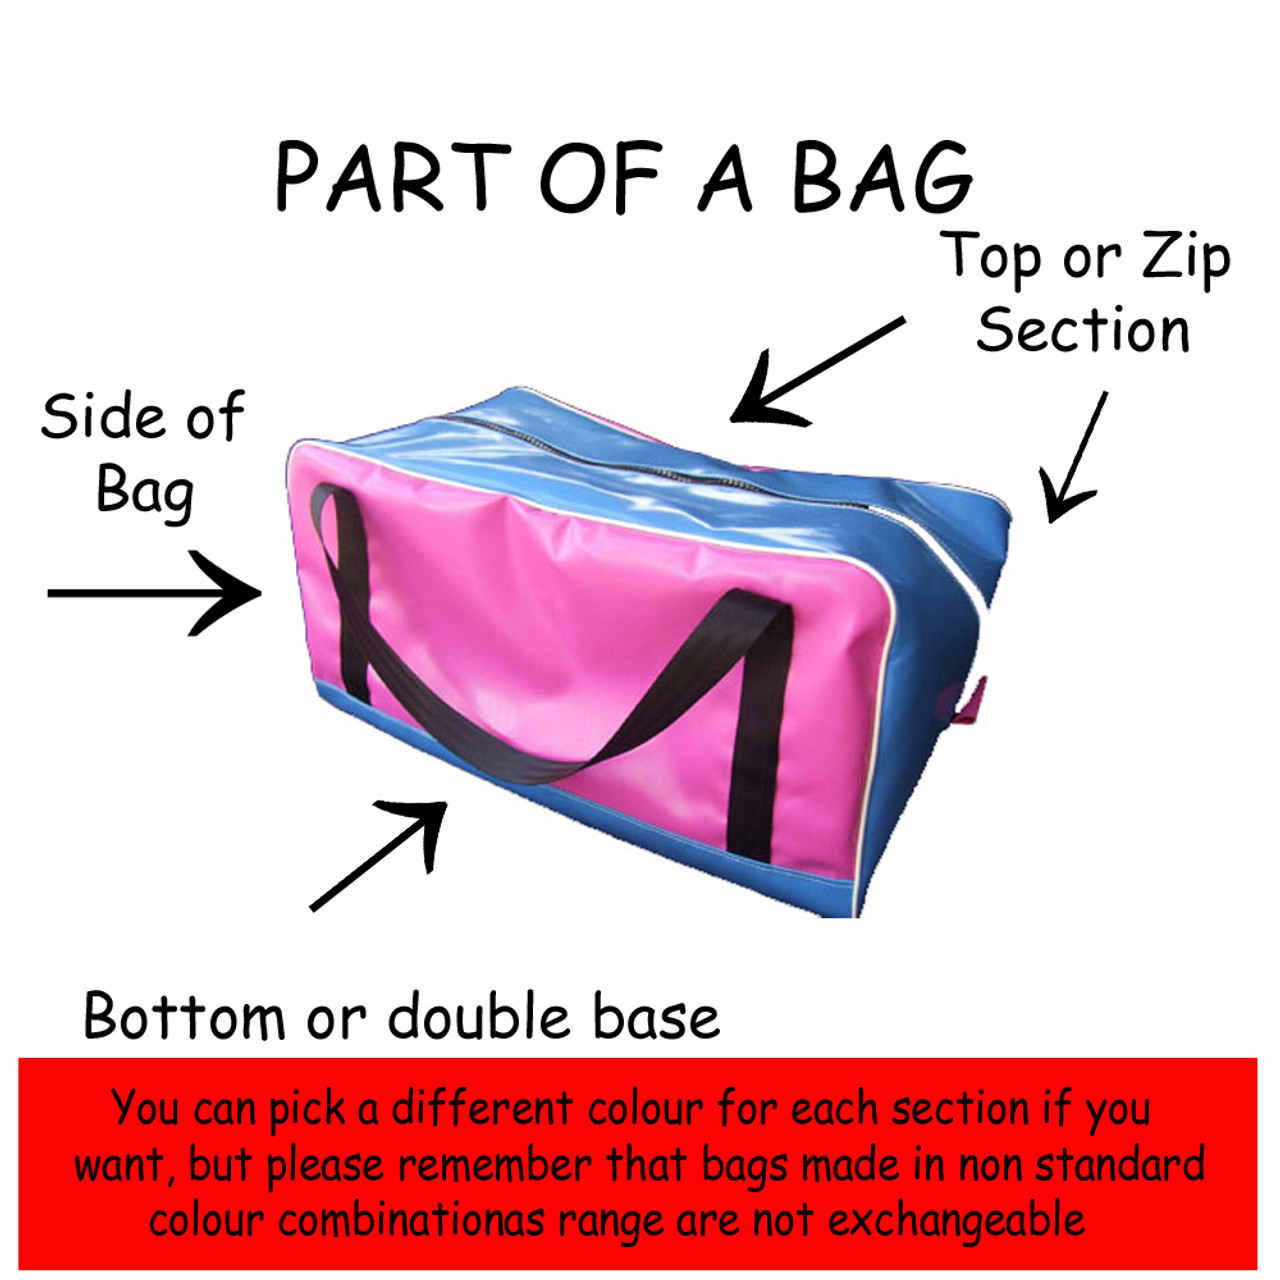 Oil Cloth Single Saddle/Work bag 60cm L x 37cm W x 41cm H